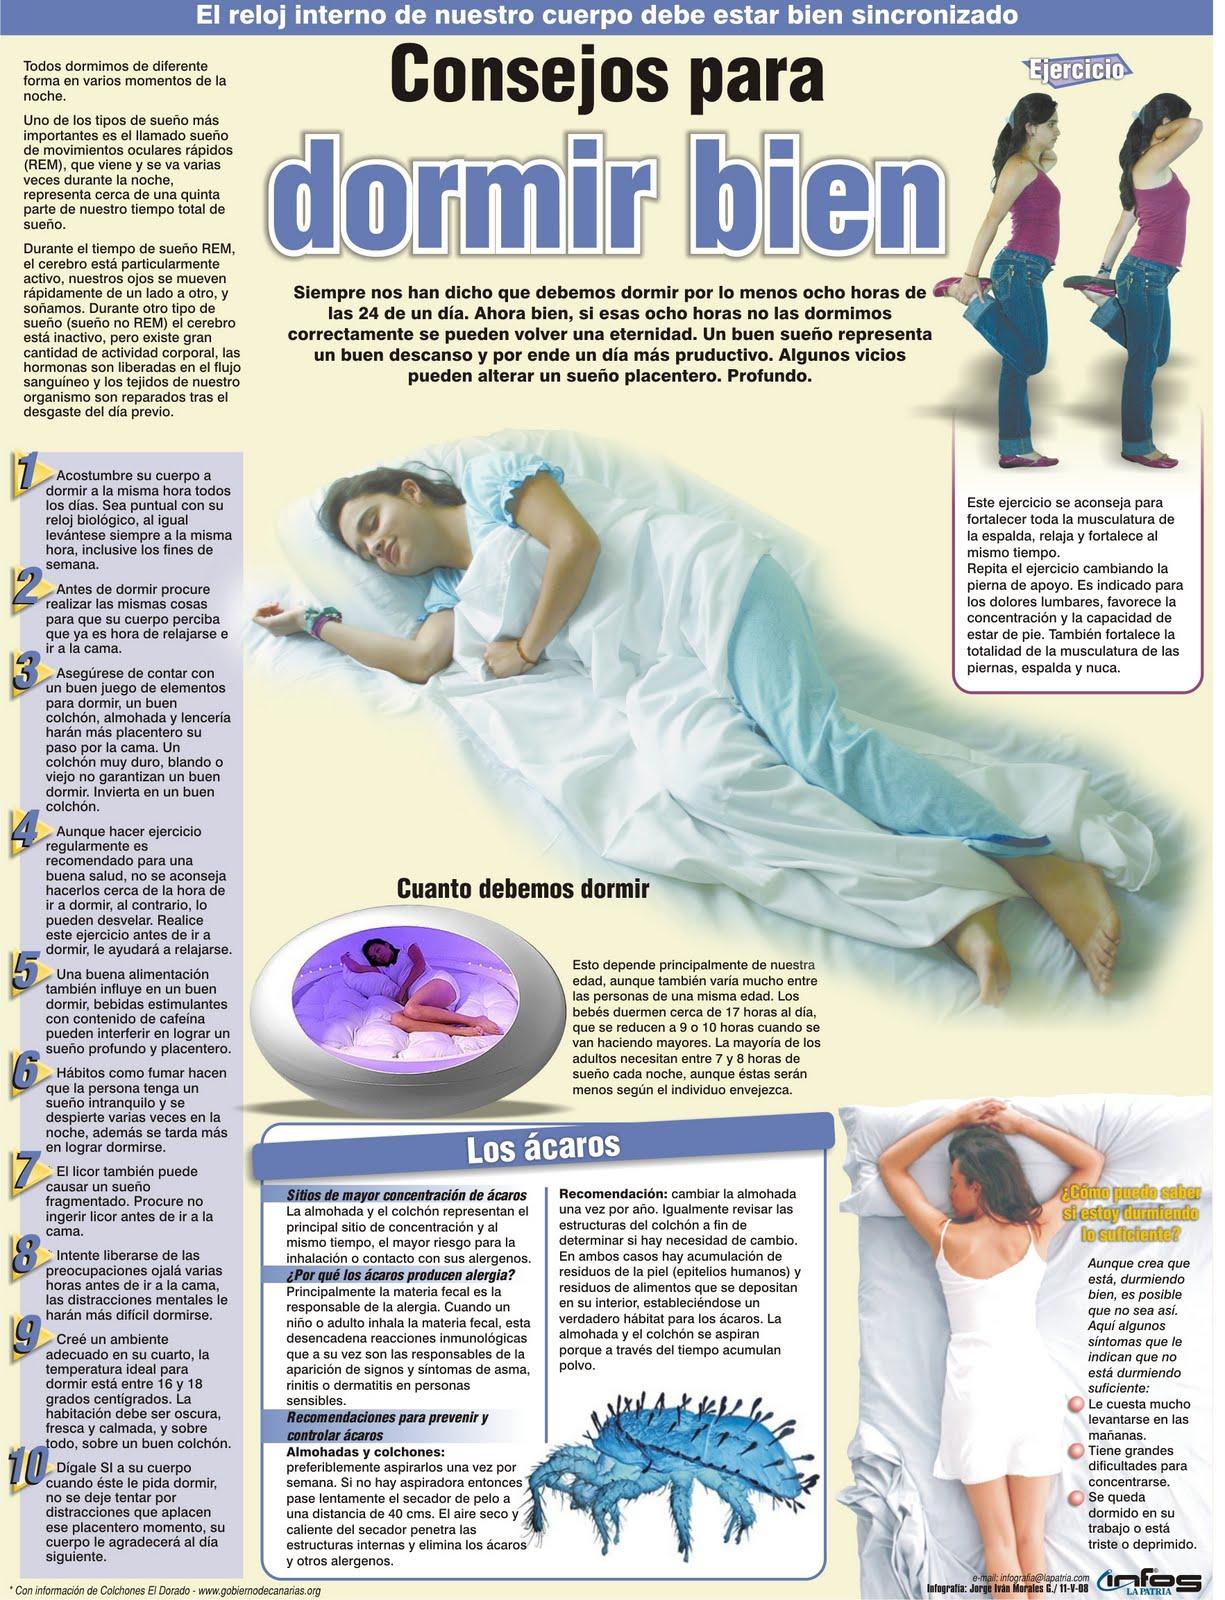 Infografia jorge morales consejos para dormir bien - Soluciones para dormir bien ...